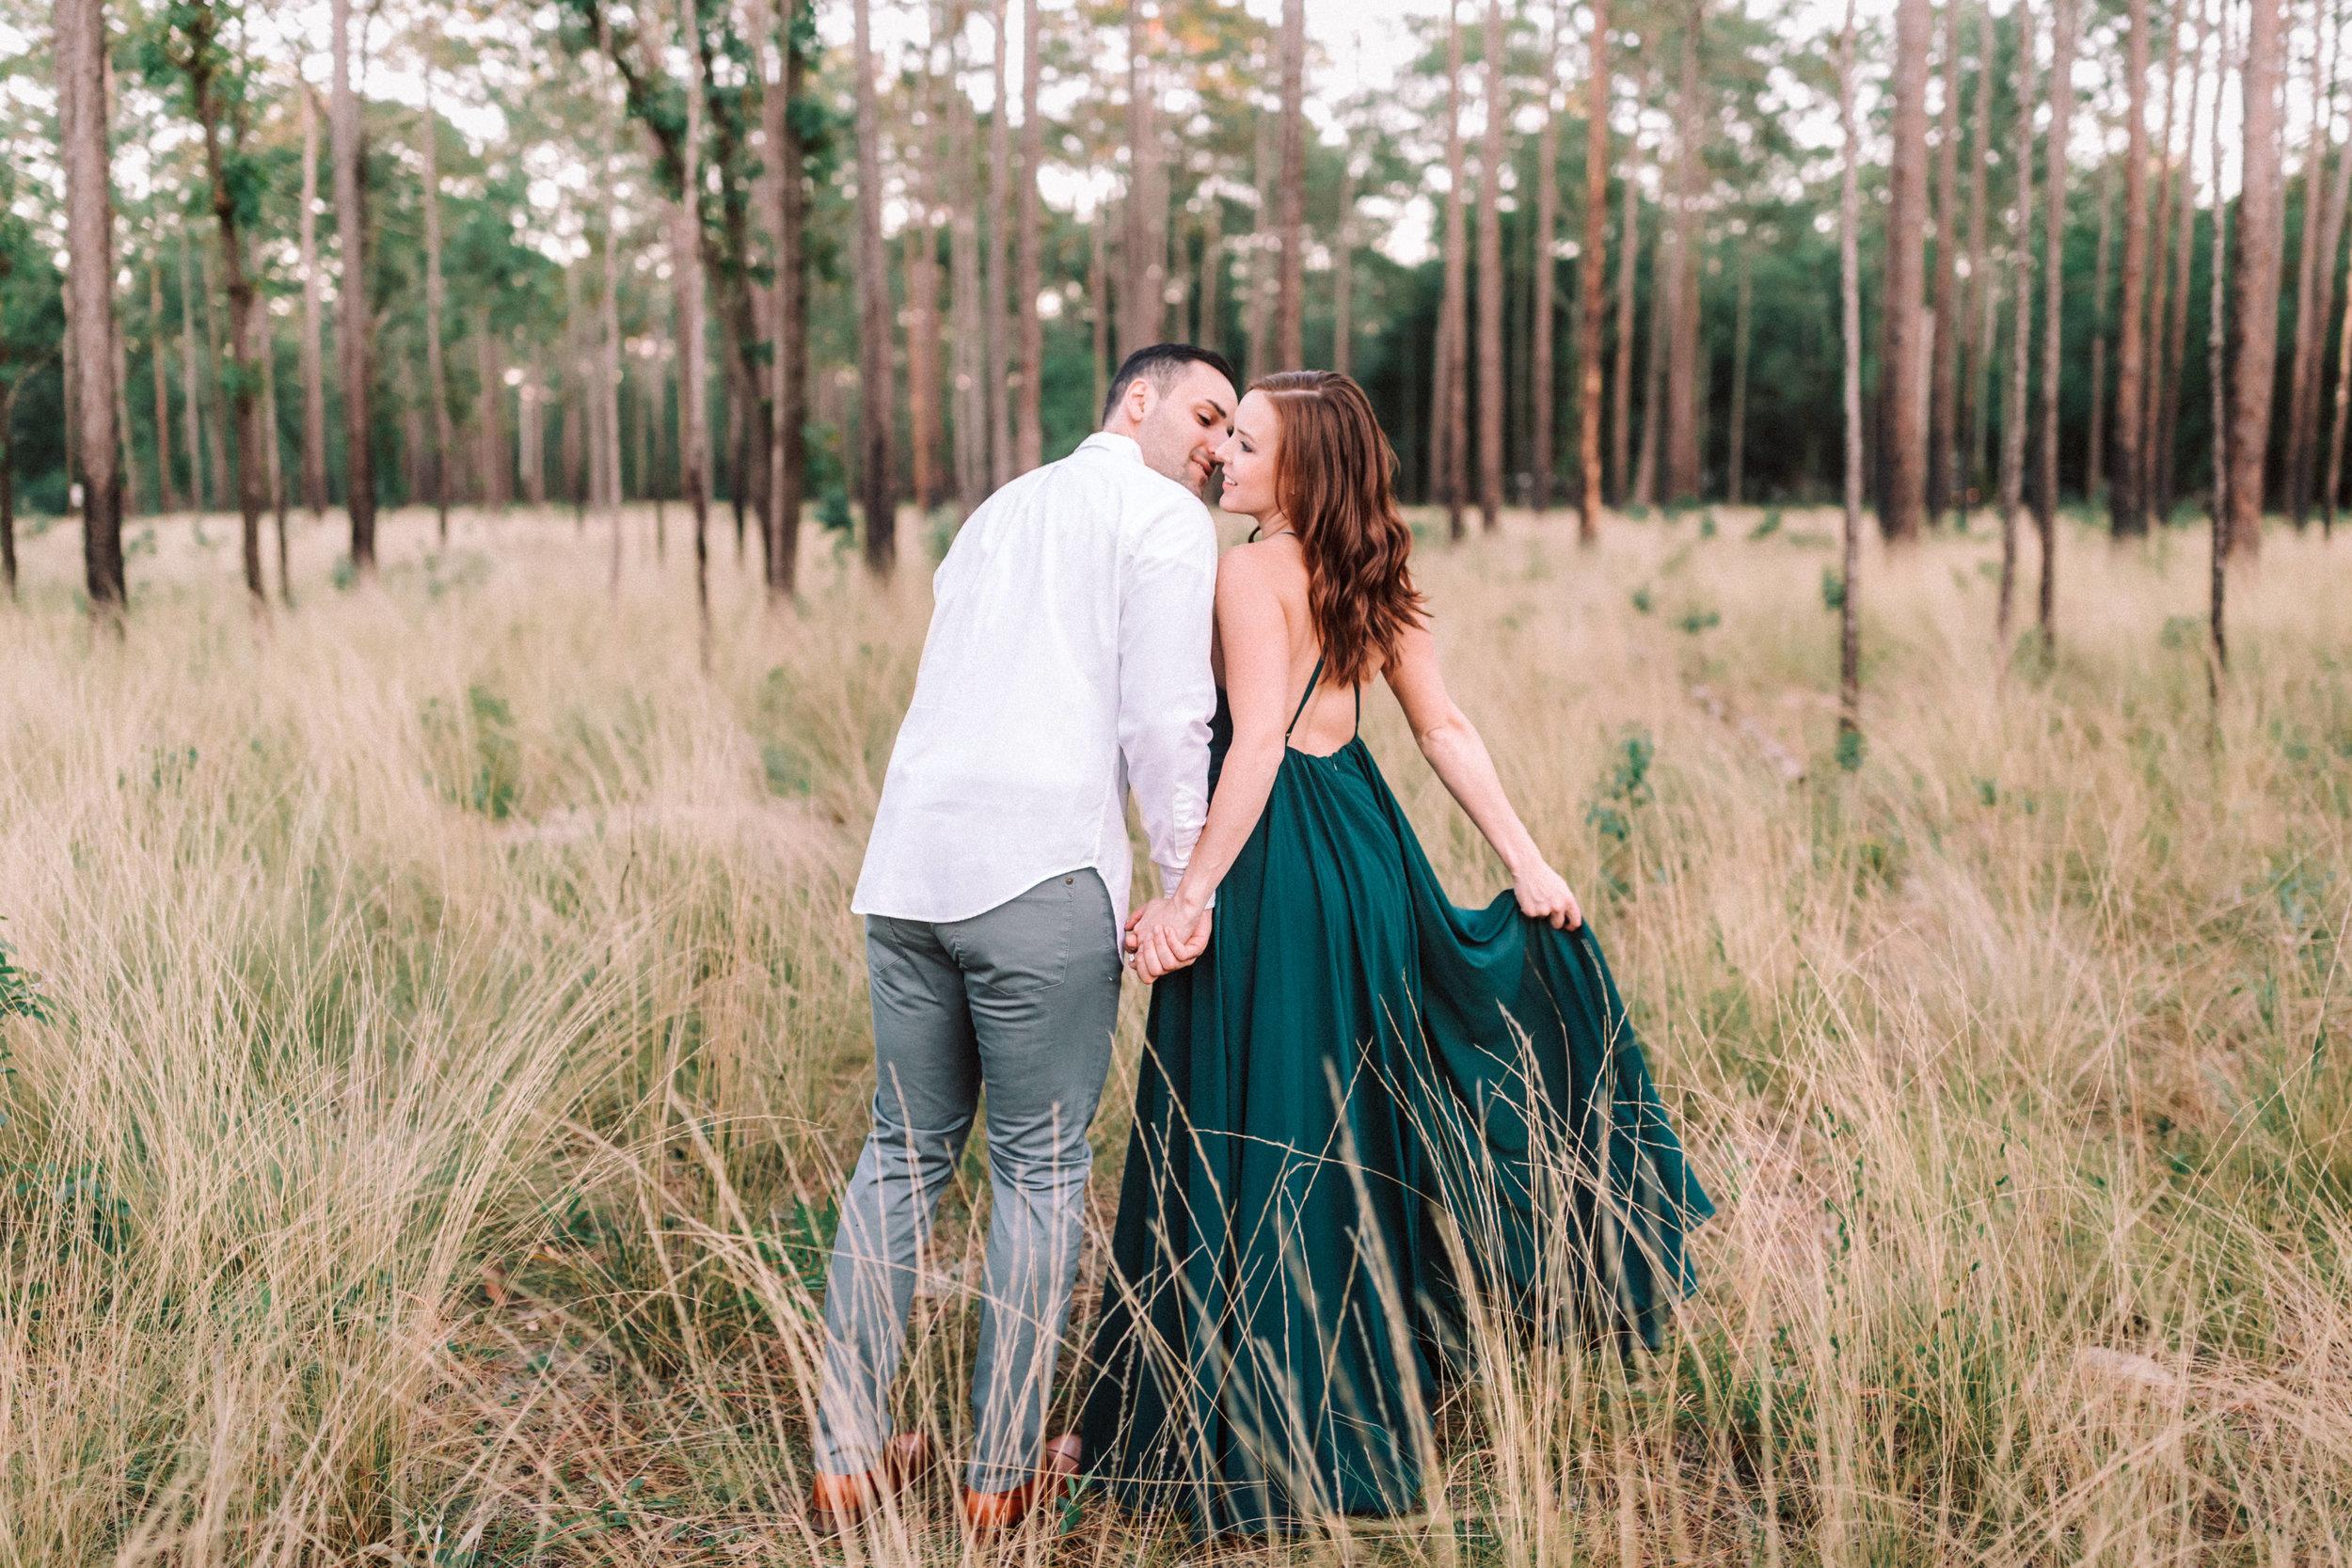 Orlando Engagement session at Wekiva Springs State Park nature-Anthony + Christine 44.jpg